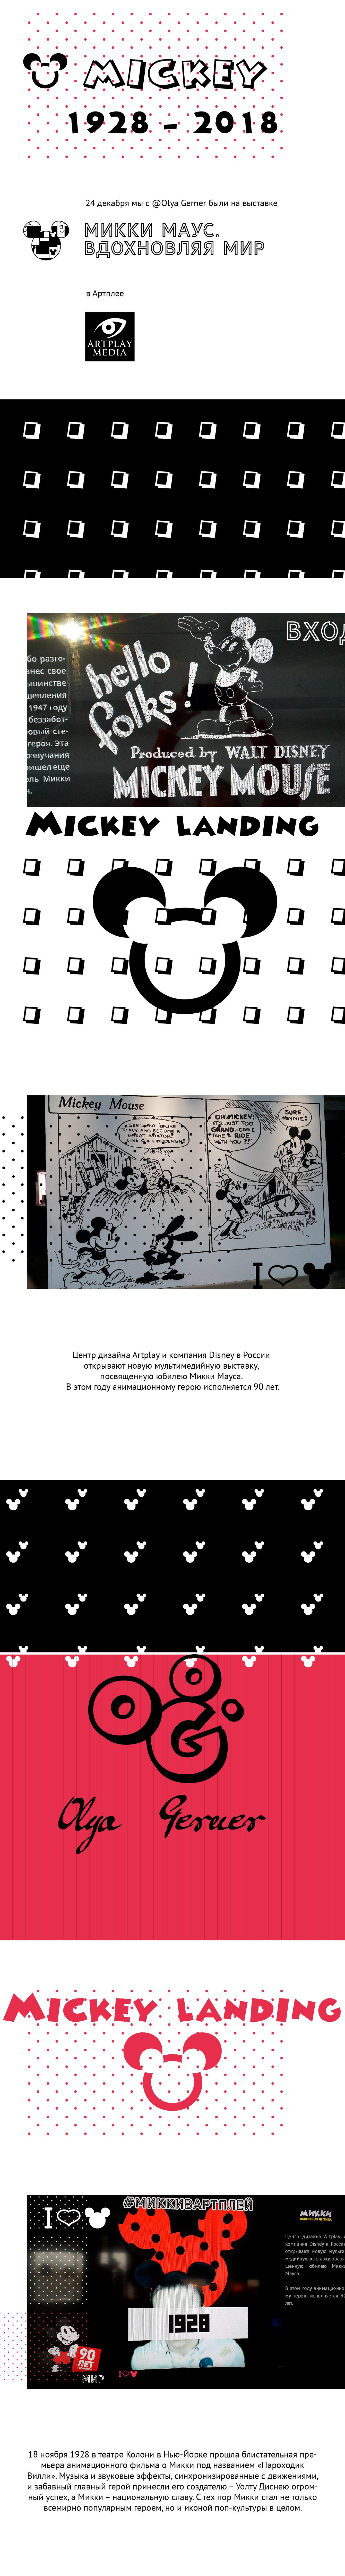 mickey mouse ArtPLay Артплей Микки Маус Вдохновляя мир